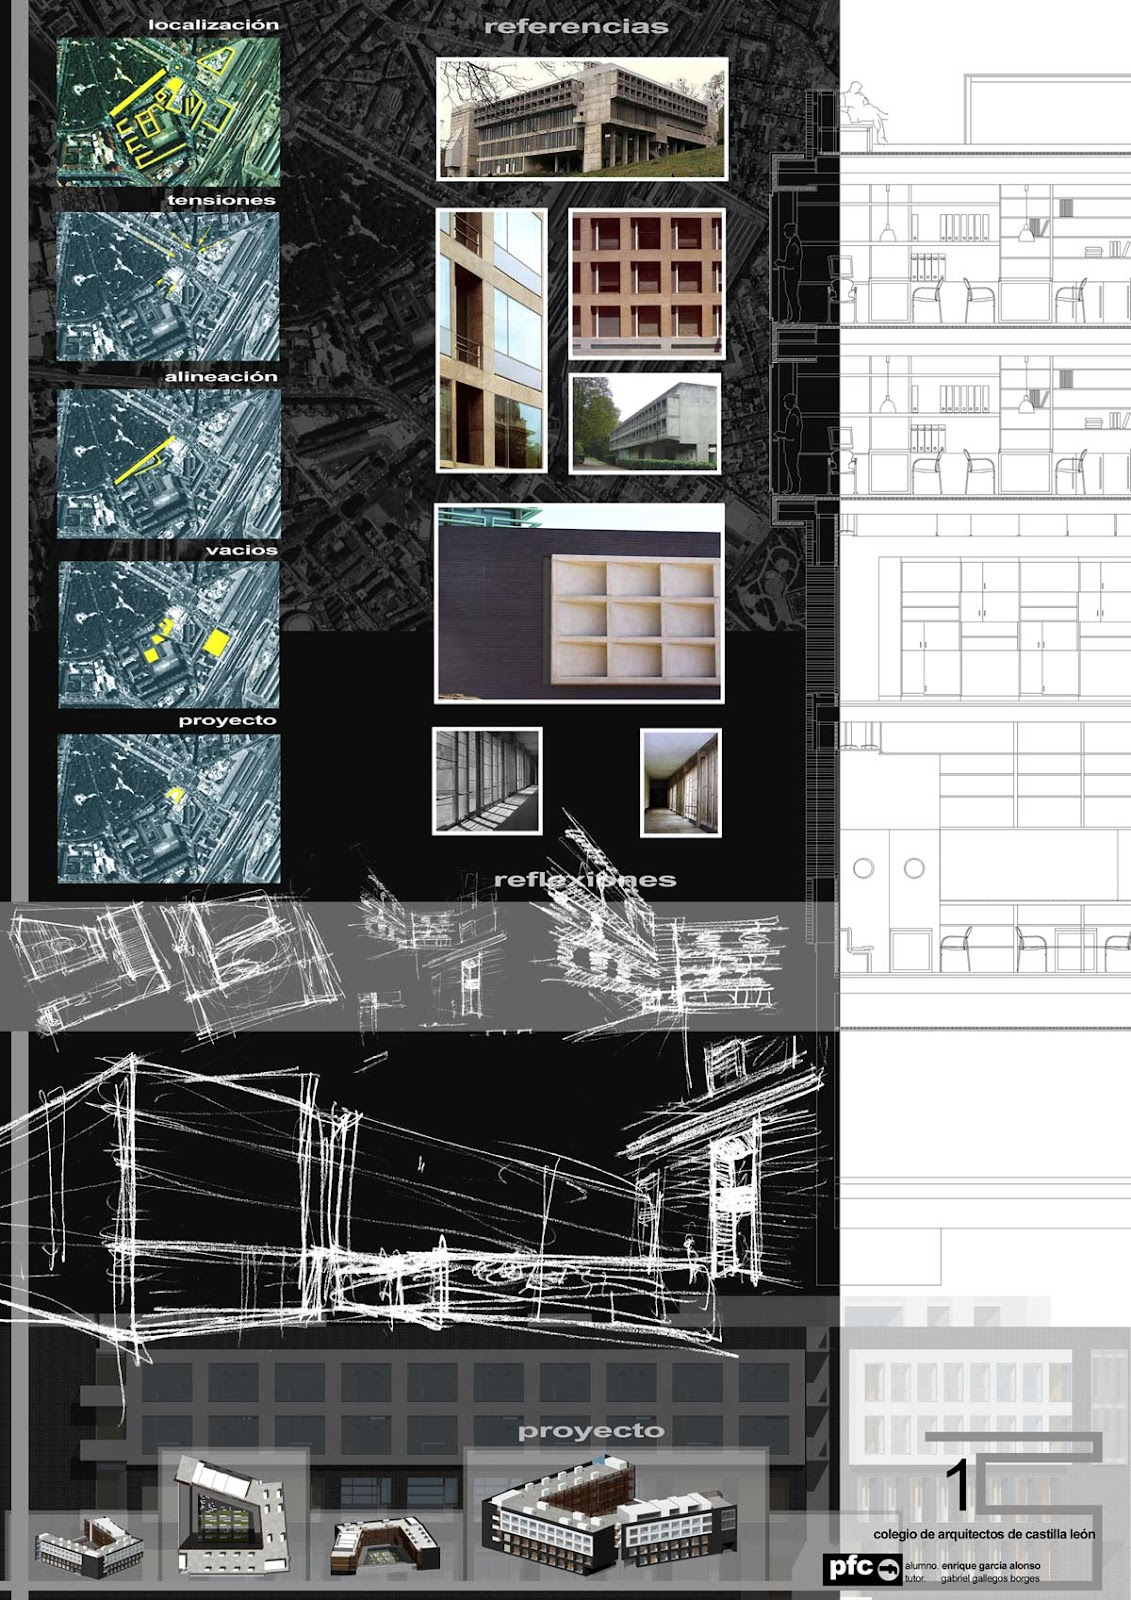 3a estudio proyectos de fin de carrera de arquitectura for Carreras de arquitectura